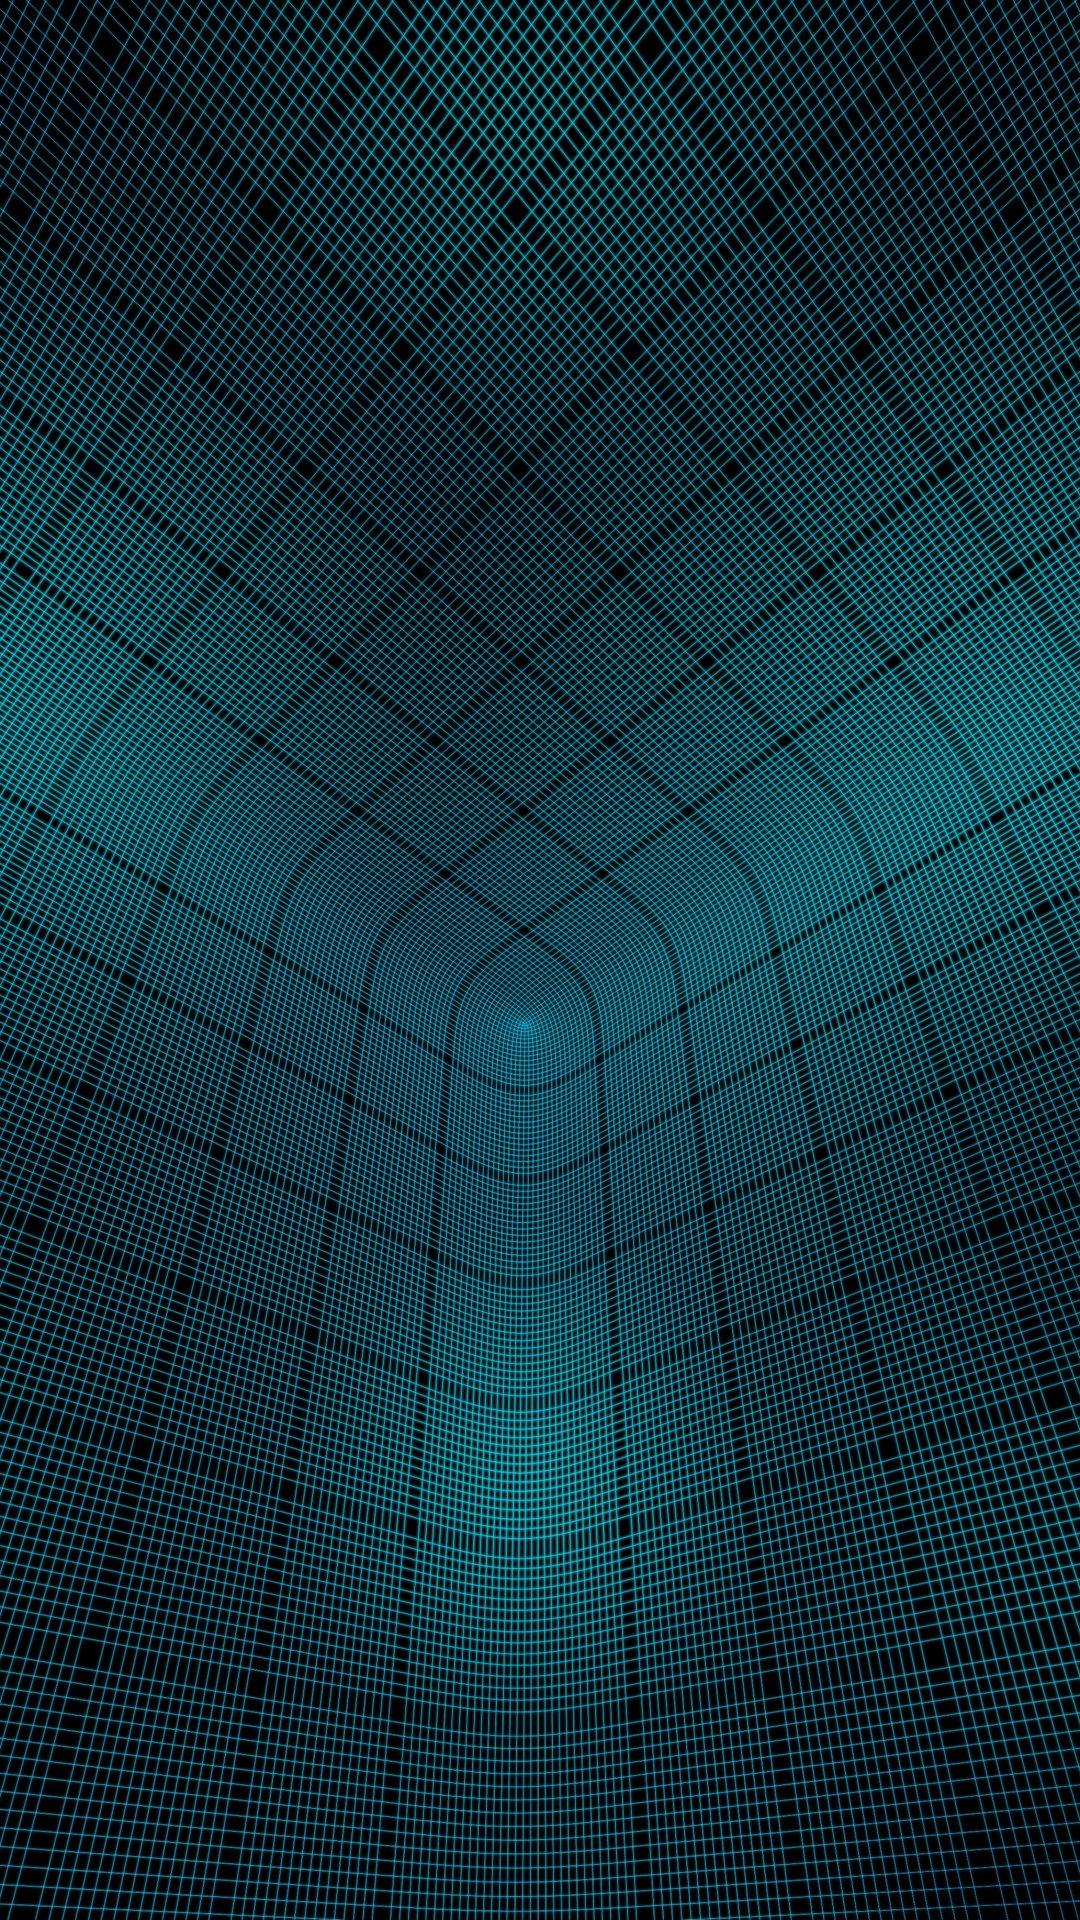 3d Mesh Optical Illusion Hd Wallpaper 1080x1920